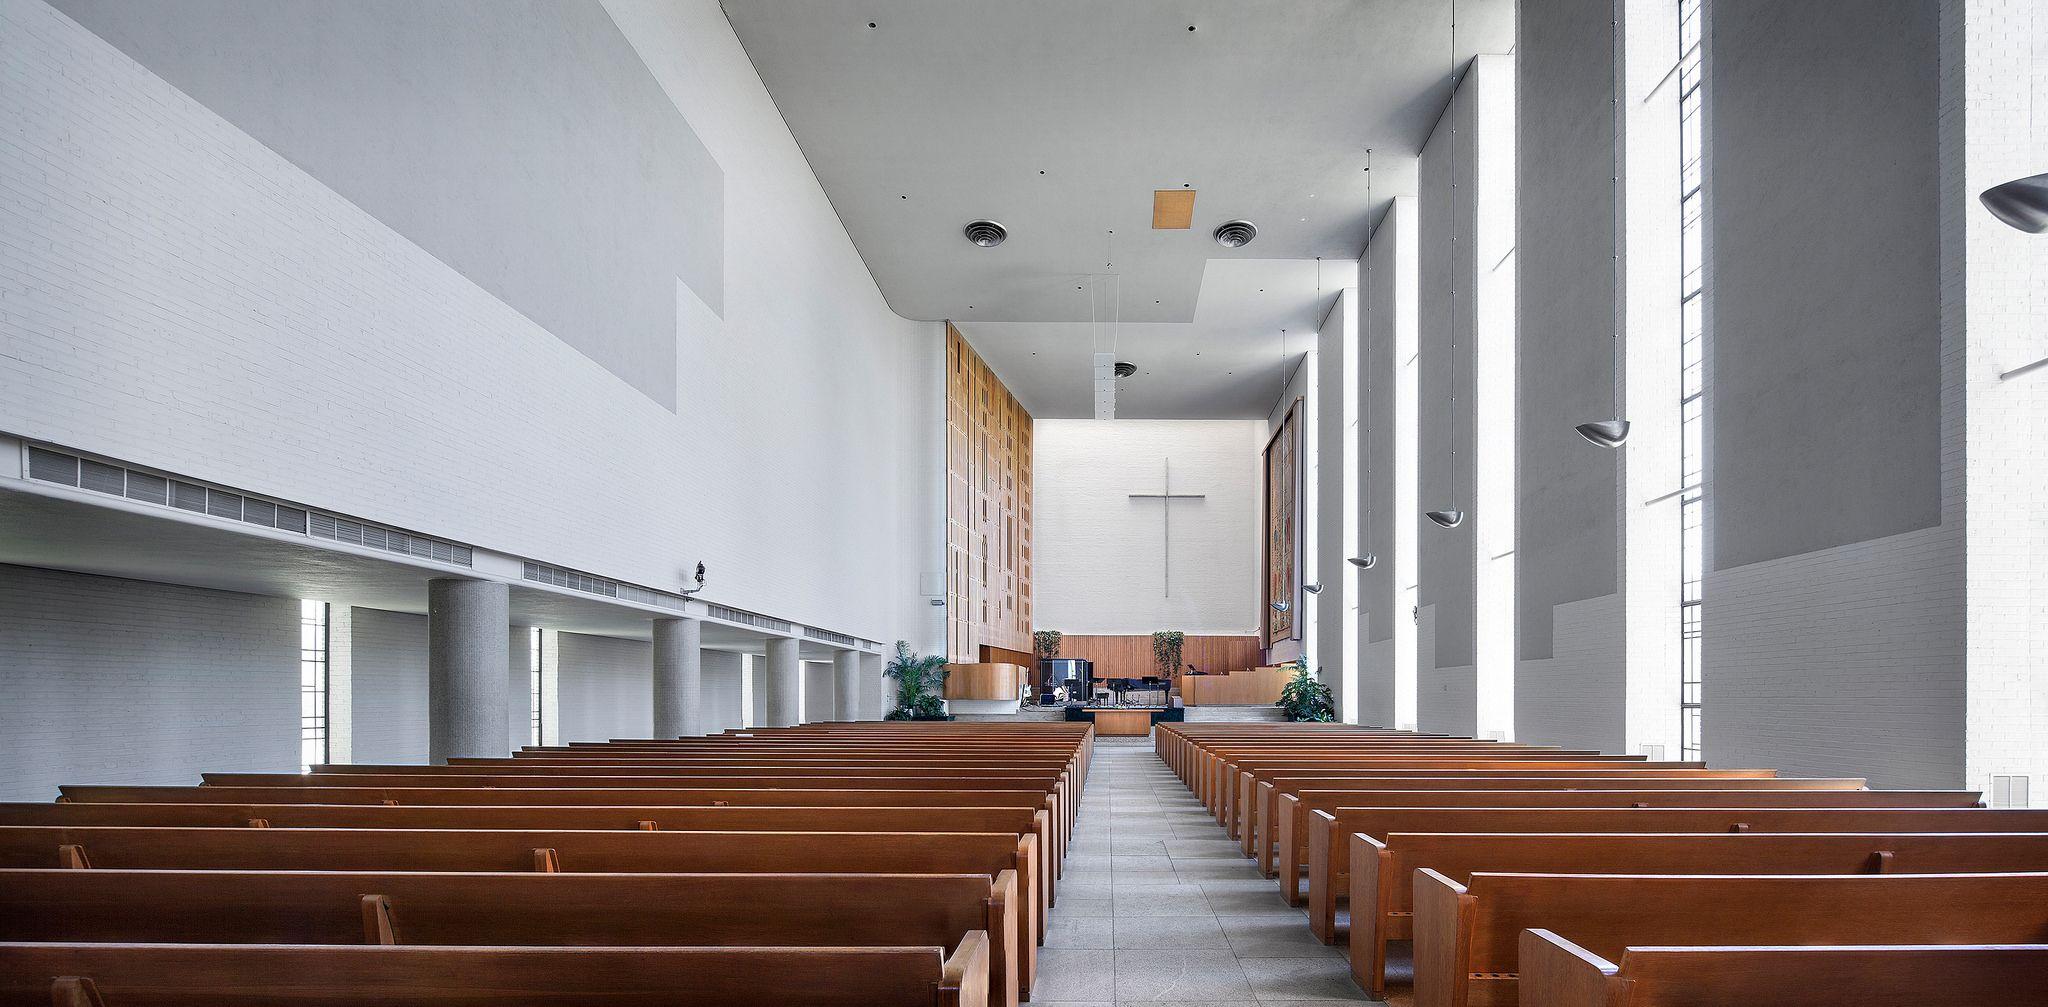 https://flic.kr/p/FpoYv5 | First Christian Church | Columbus, IN | Eliel Saarinen | Sacred Sites  September 2015 First Christian Church Columbus, Indiana Eliel Saarinen